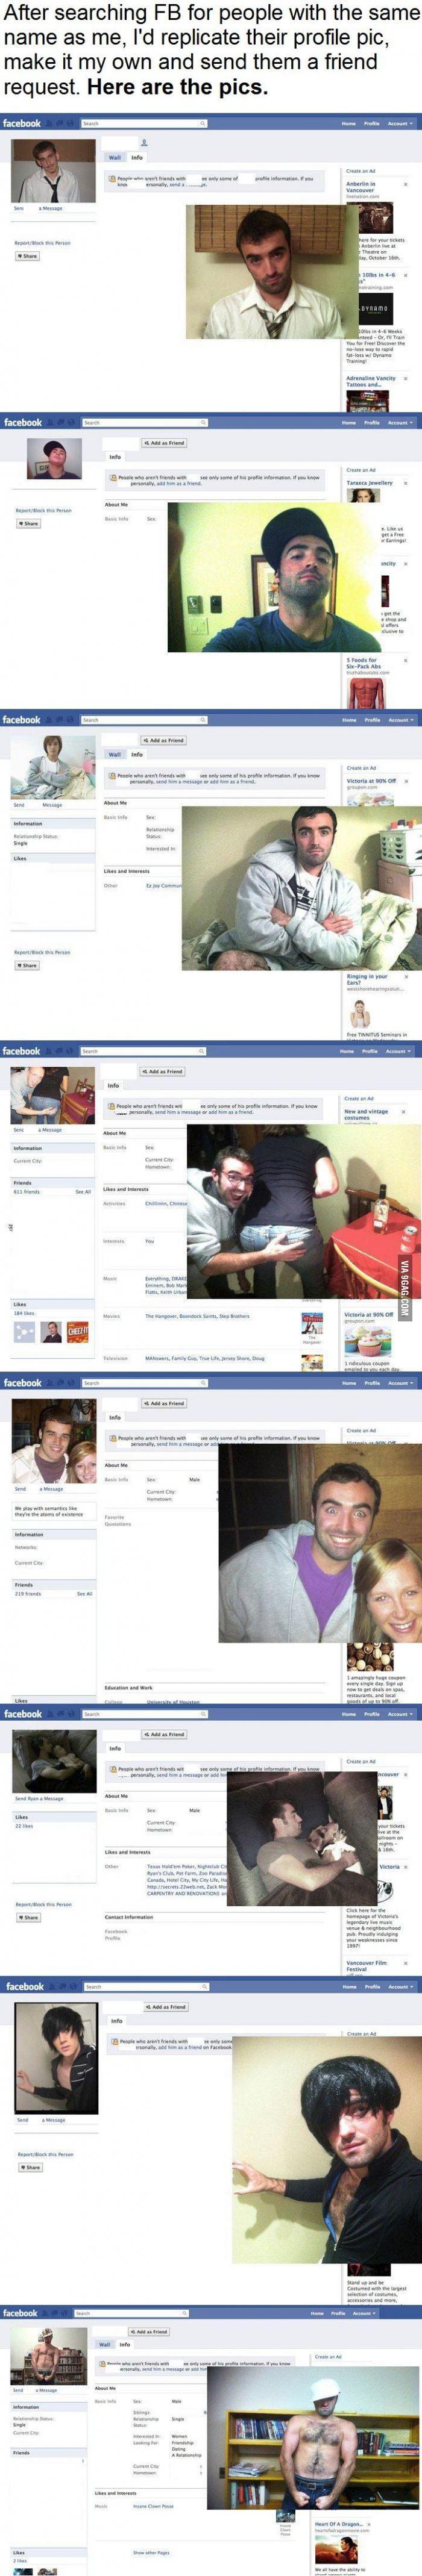 FB profile pic replication lvl: over 9000